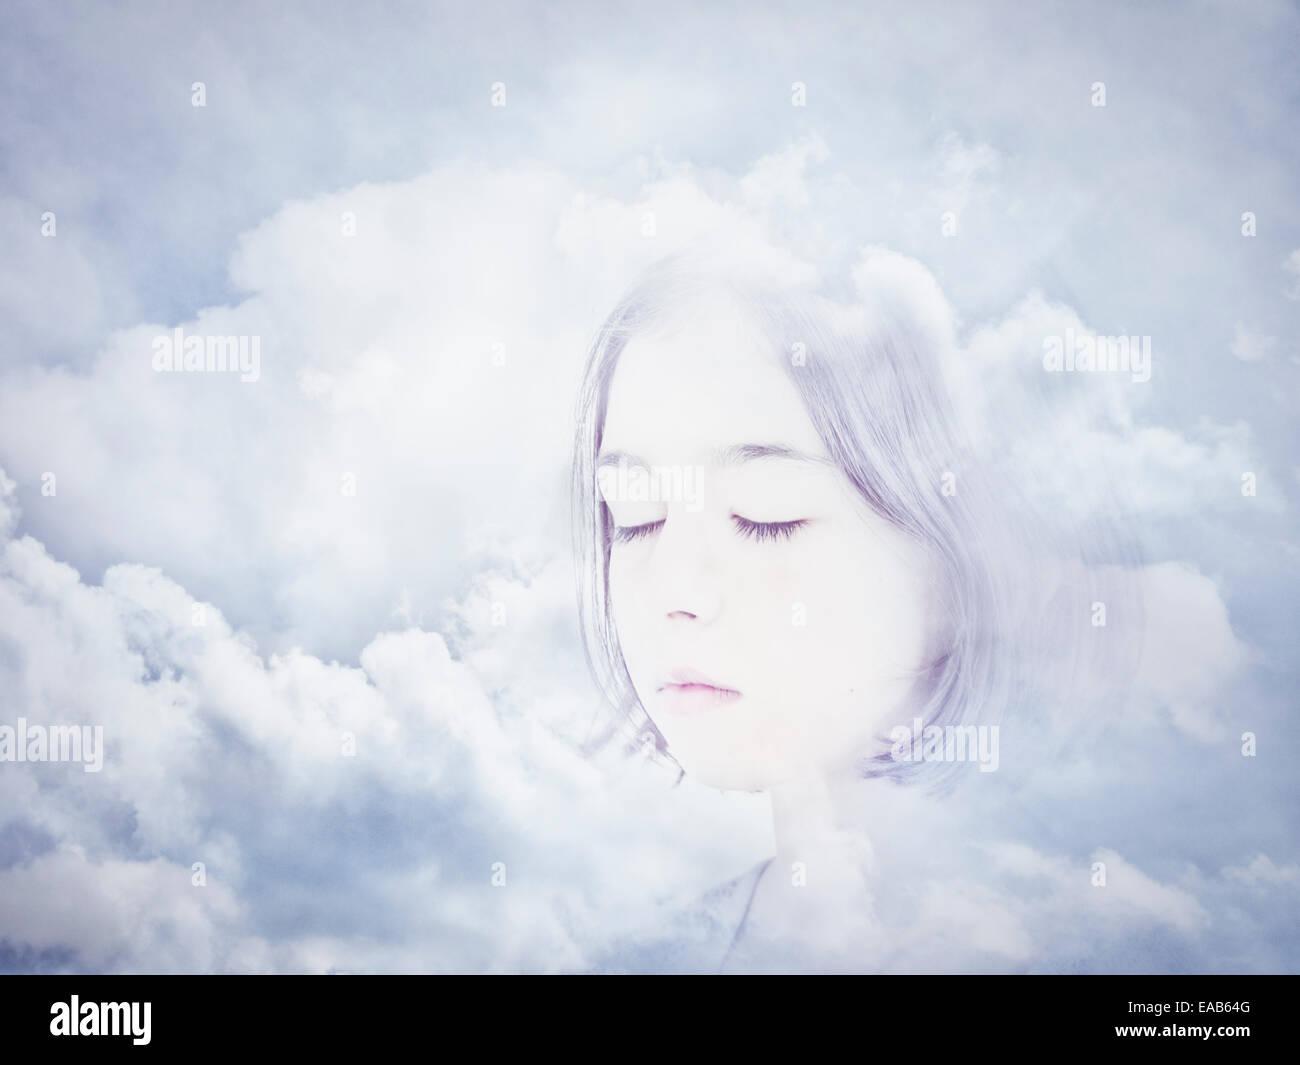 Gesicht in den Wolken. Digital Composite. Stockbild